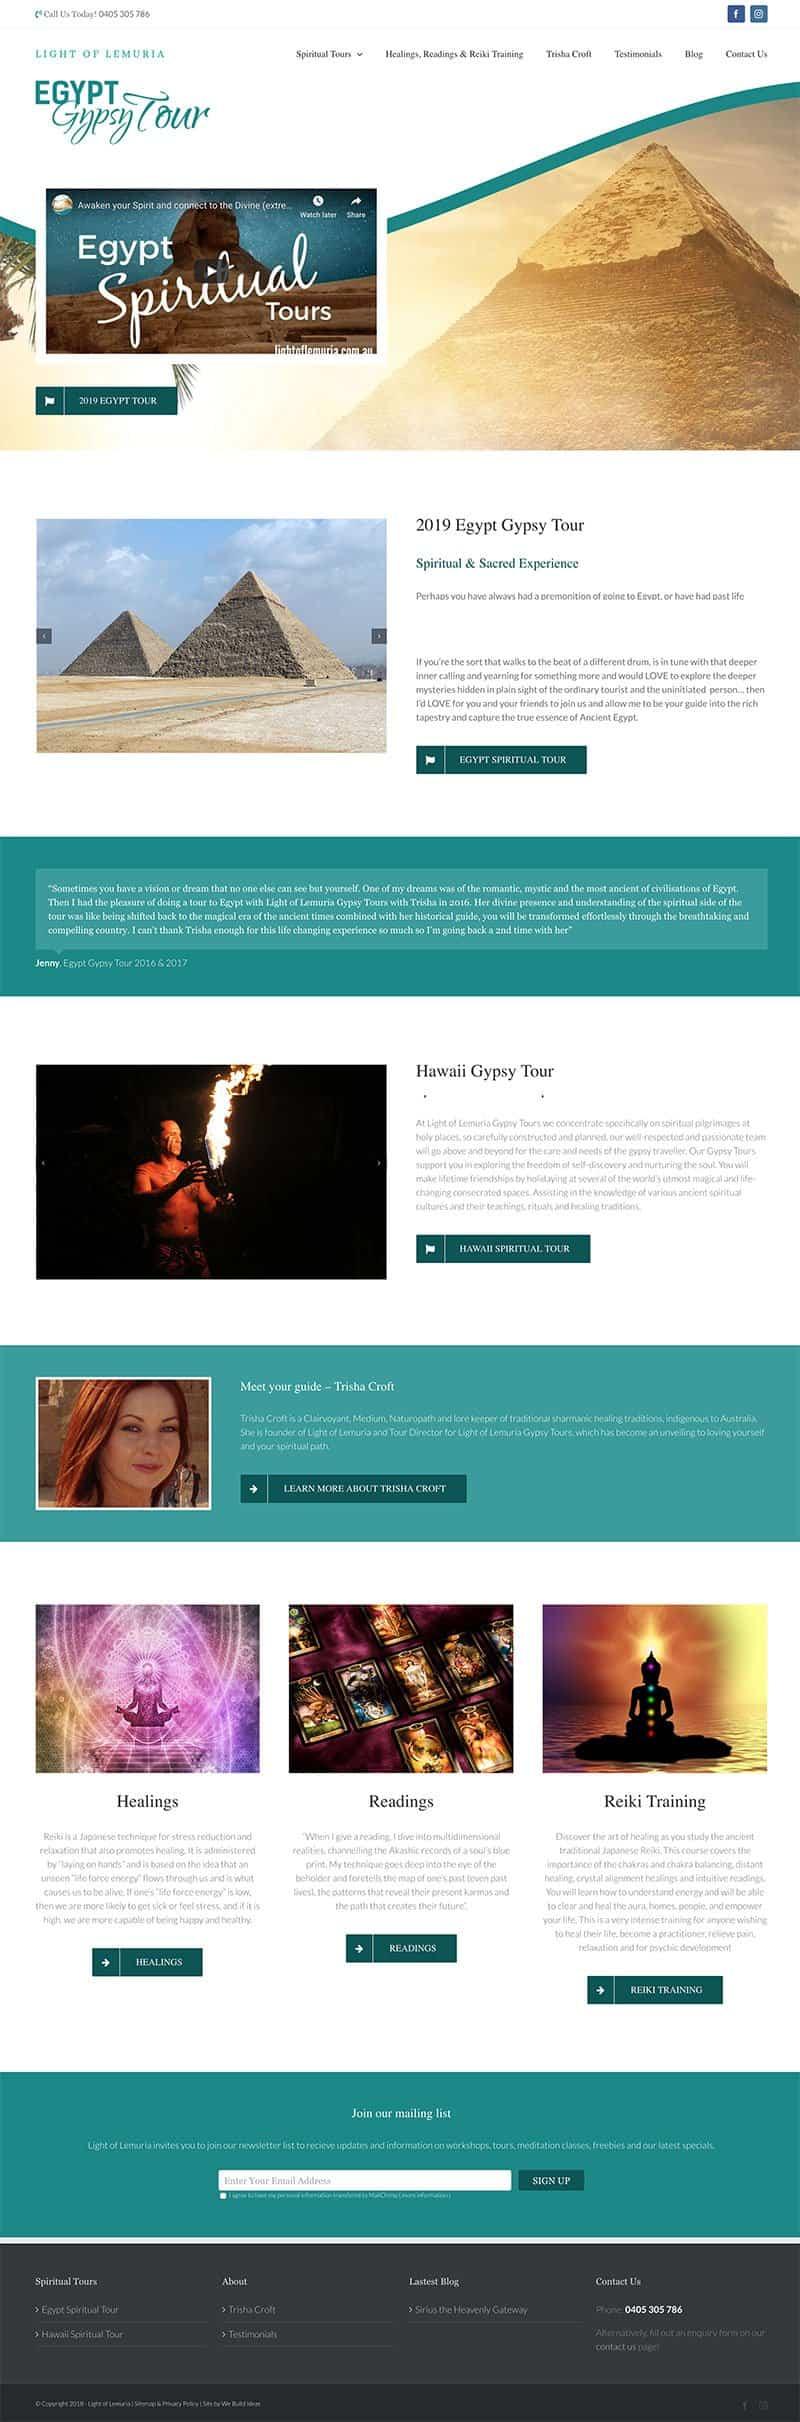 Light-of-Lemuria-Website-Case-Study